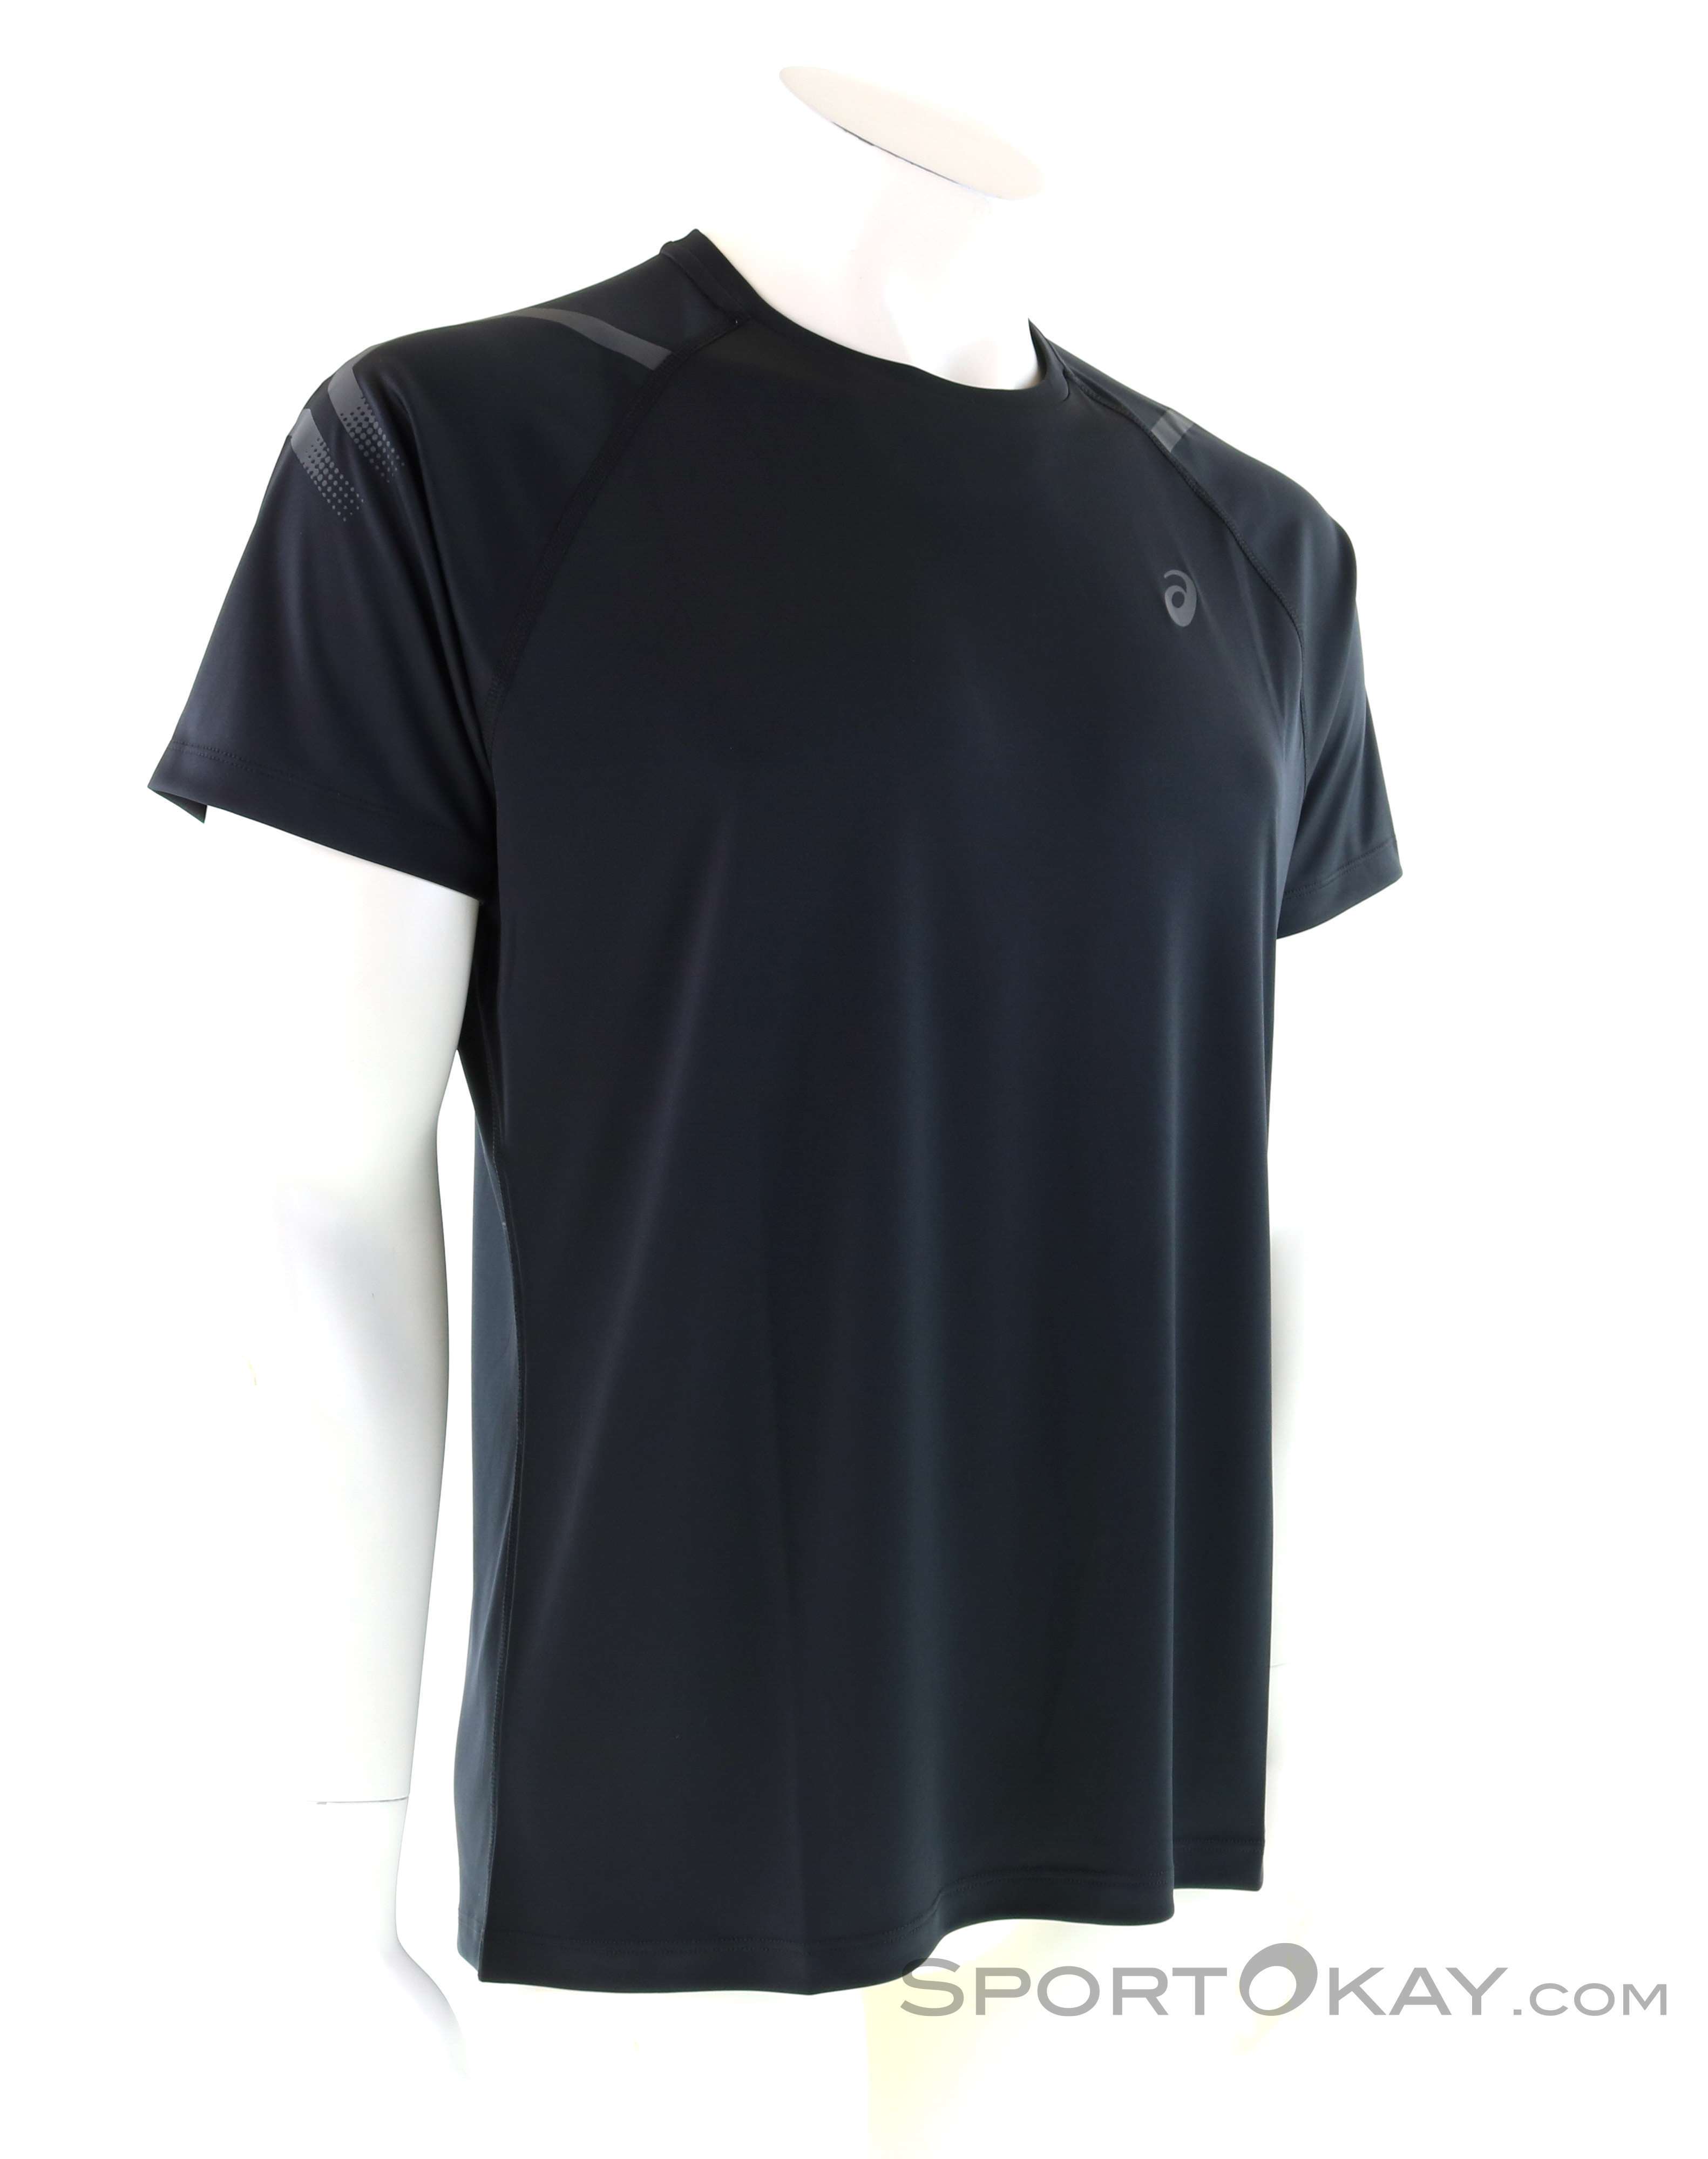 Asics Icon SS Top Mens T Shirt Shirts & T Shirts Fitness